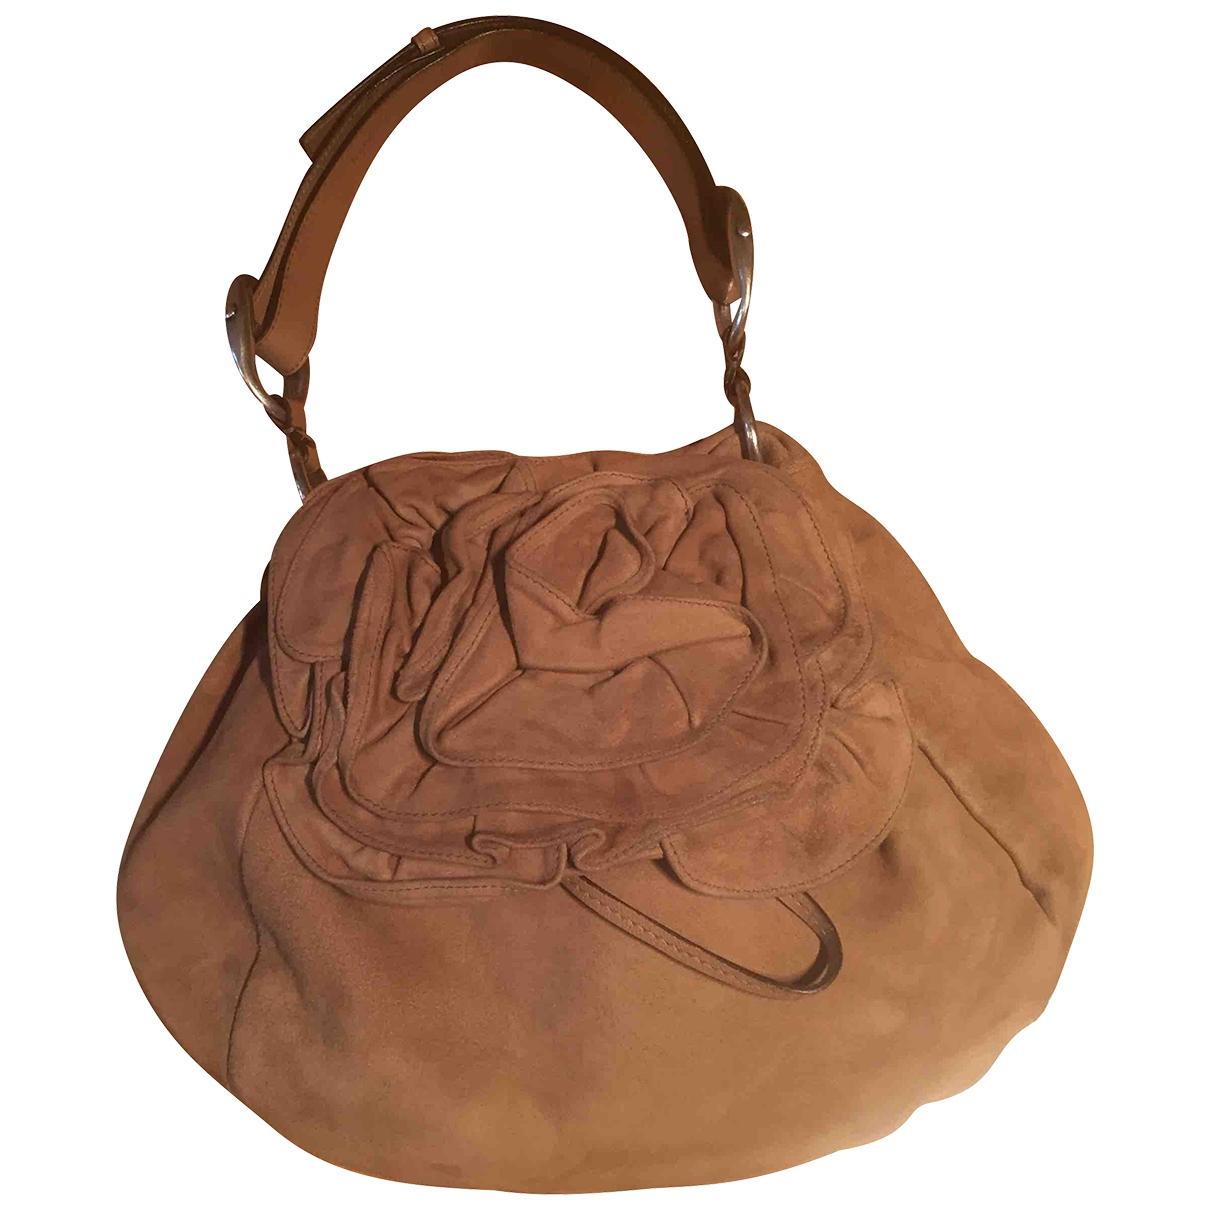 Yves Saint Laurent \N Handtasche in  Beige Veloursleder